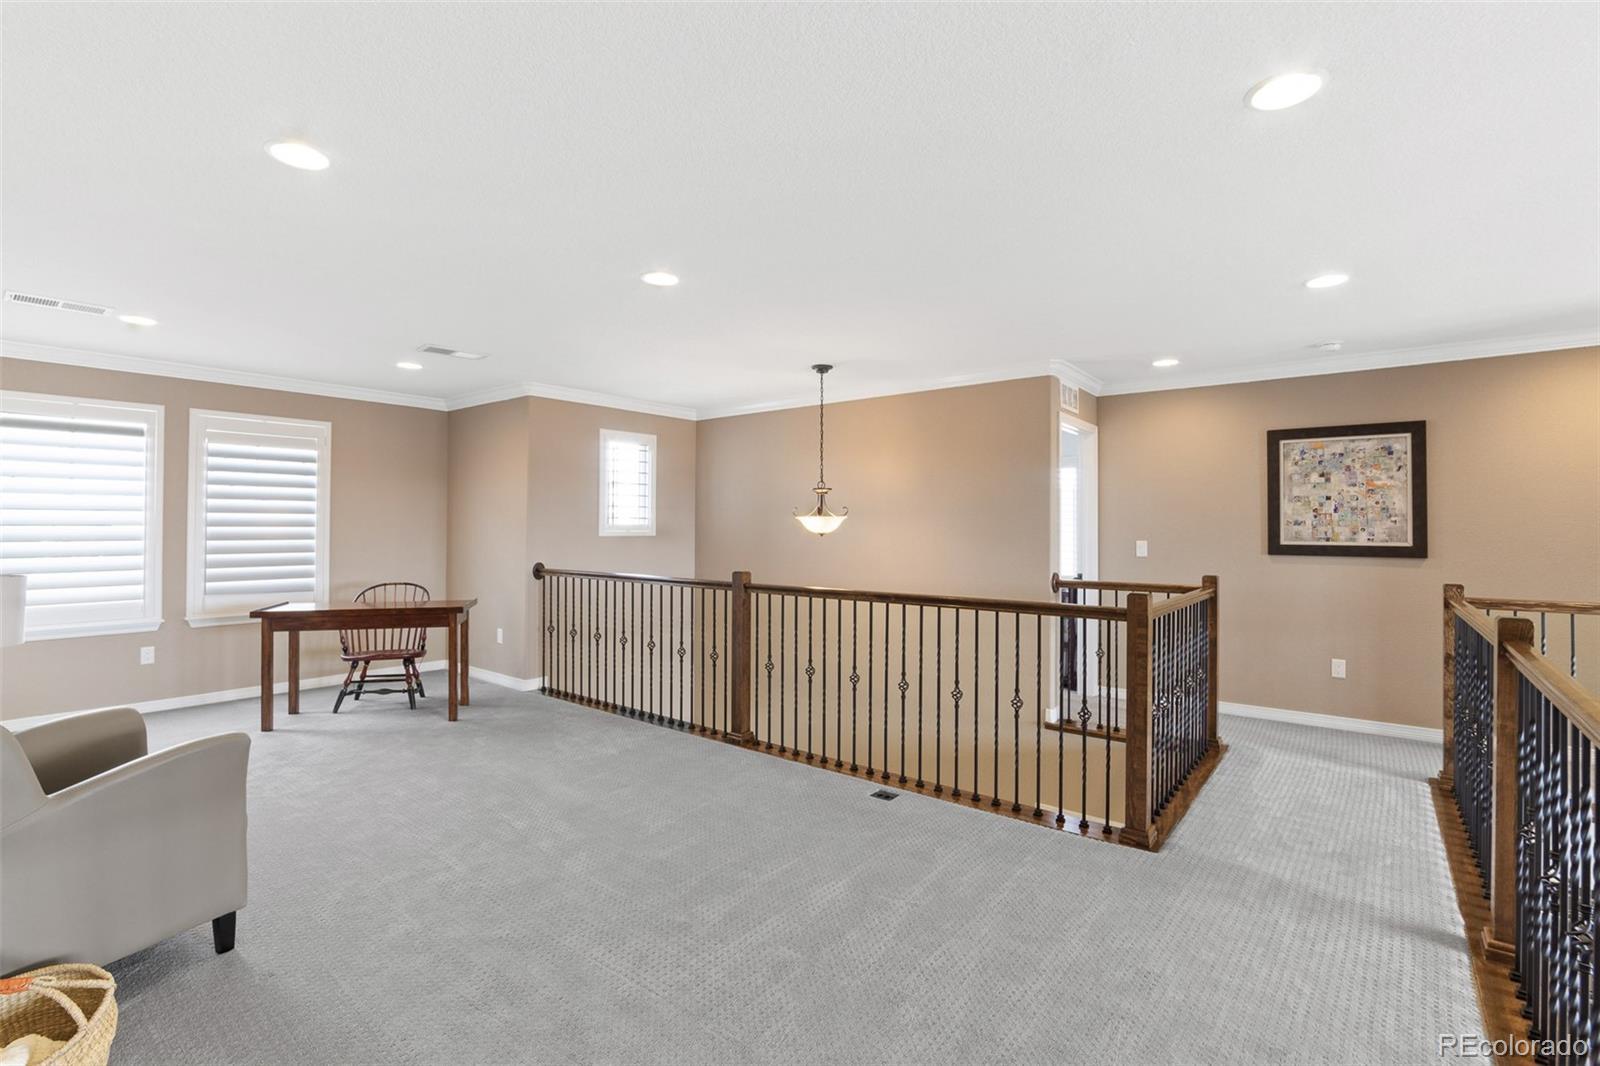 MLS# 3370359 - 29 - 4195 Red Bird Court, Castle Rock, CO 80108